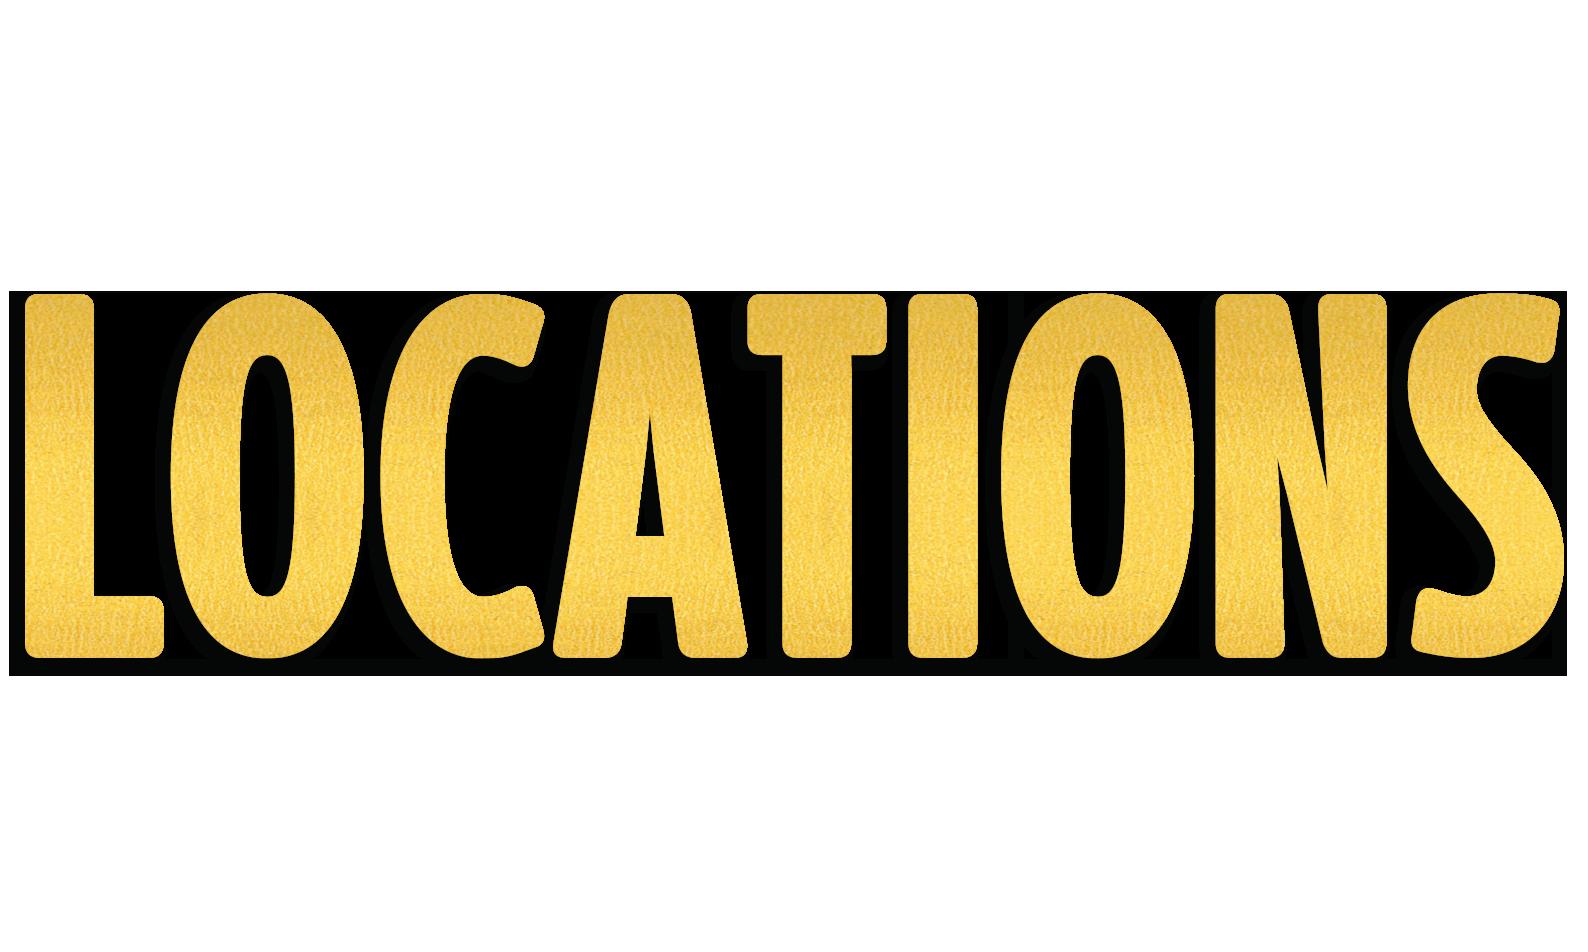 locations-headline.png